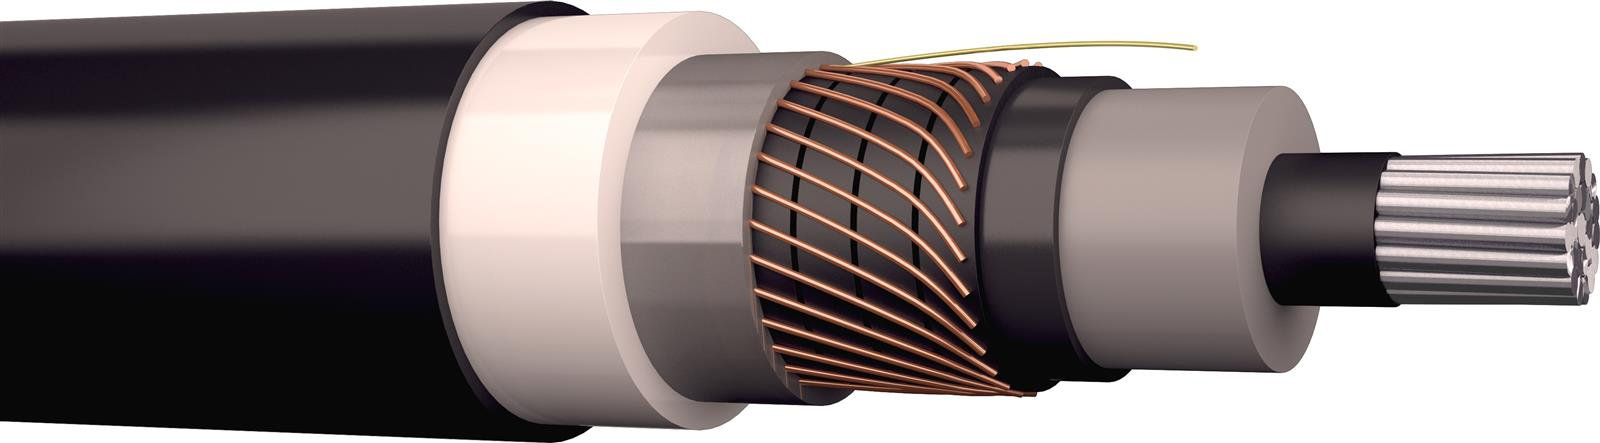 AXLJ-TTCL 1X400/35 12 KV